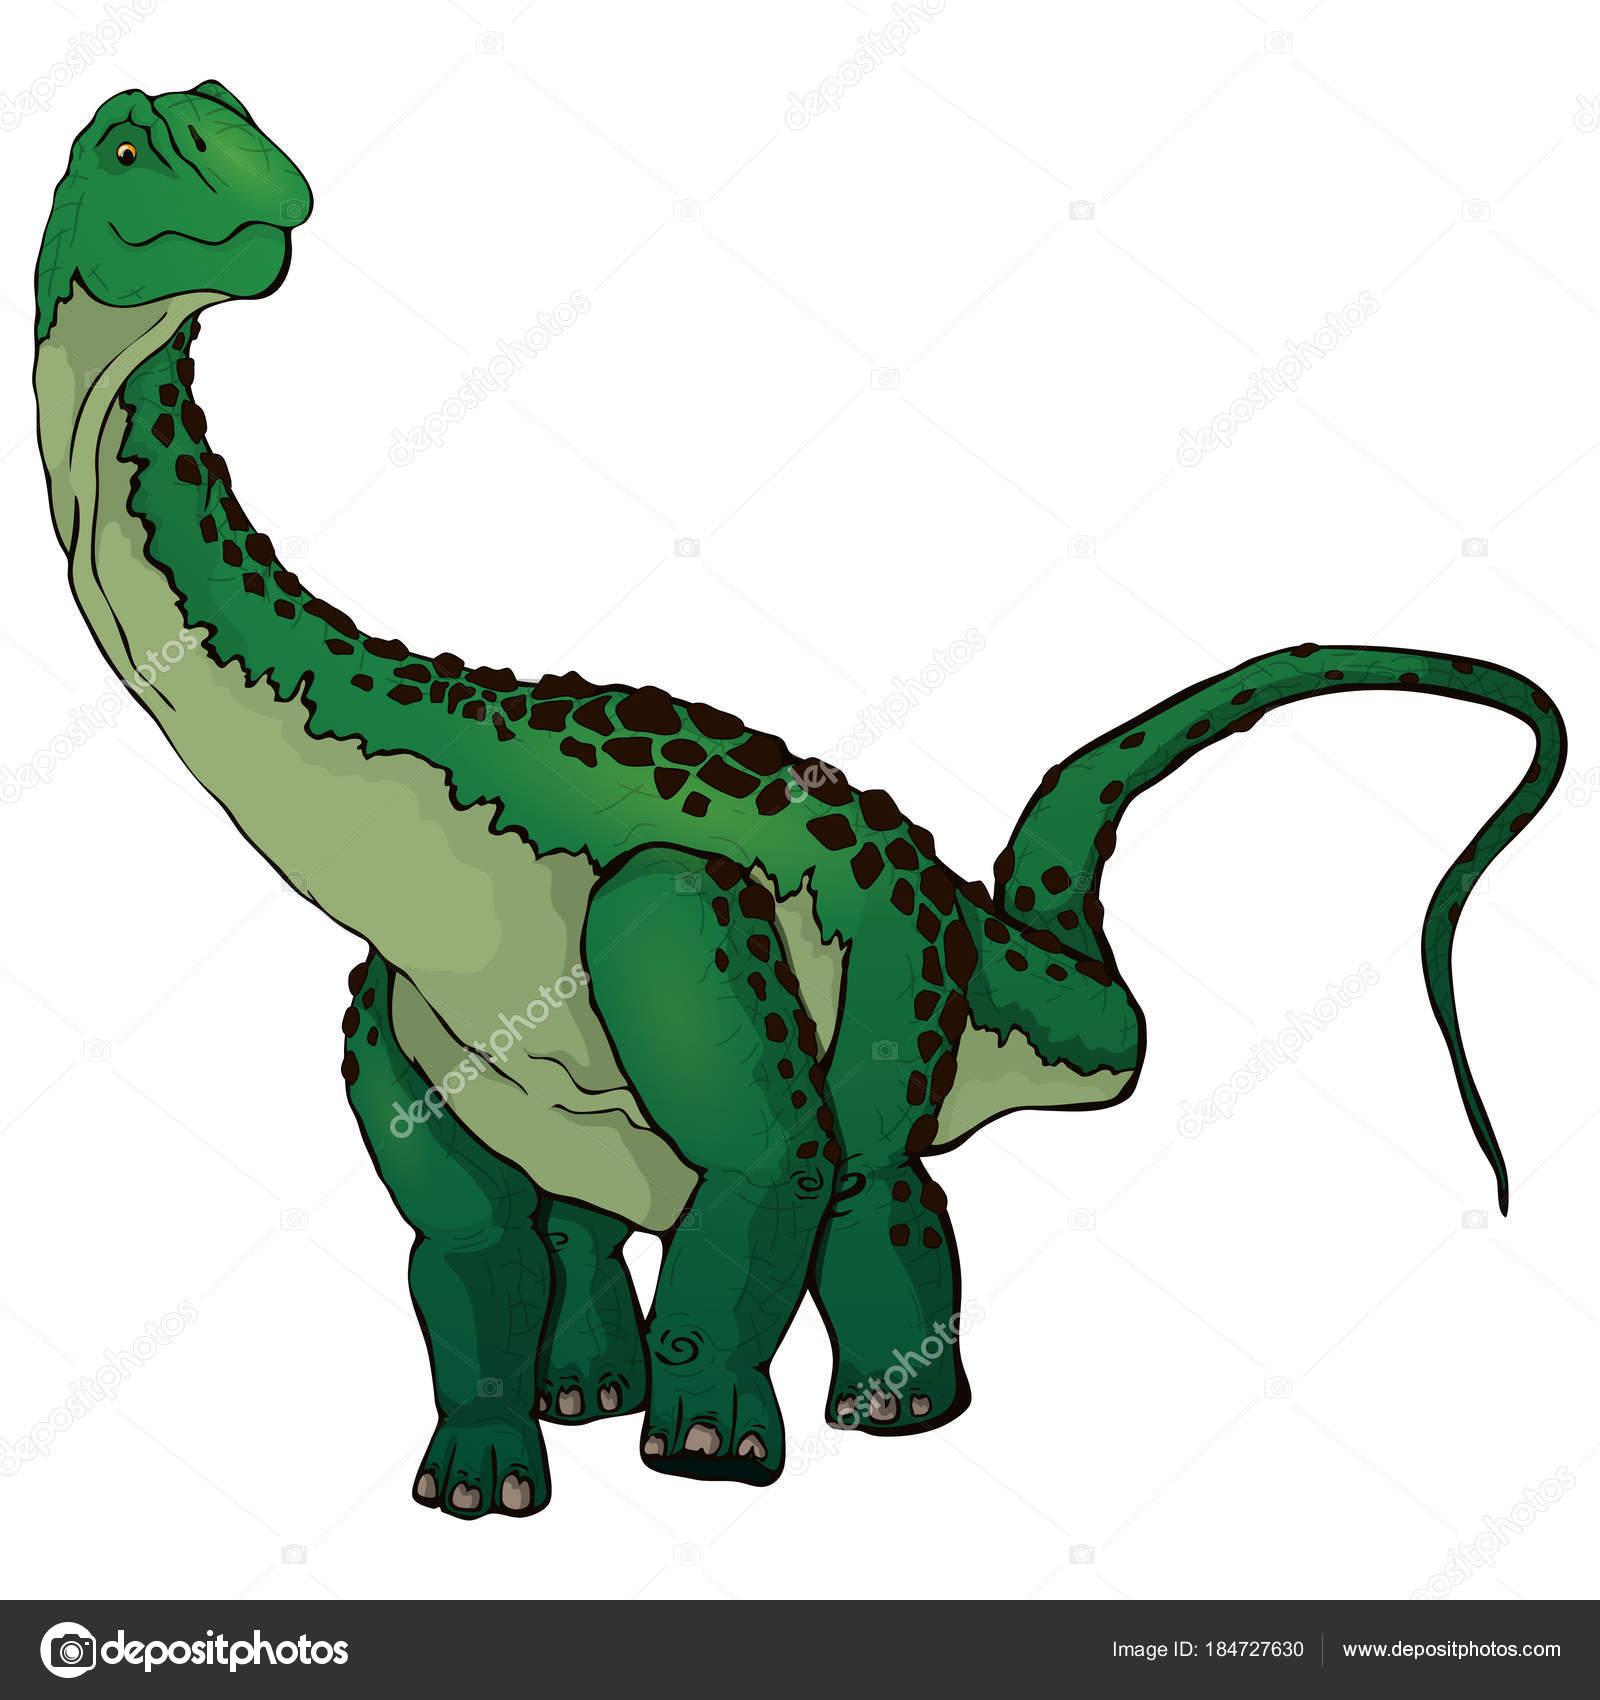 Diplodocus dessin anim mignon image vectorielle kovalchuk130195 184727630 - Dessin de diplodocus ...